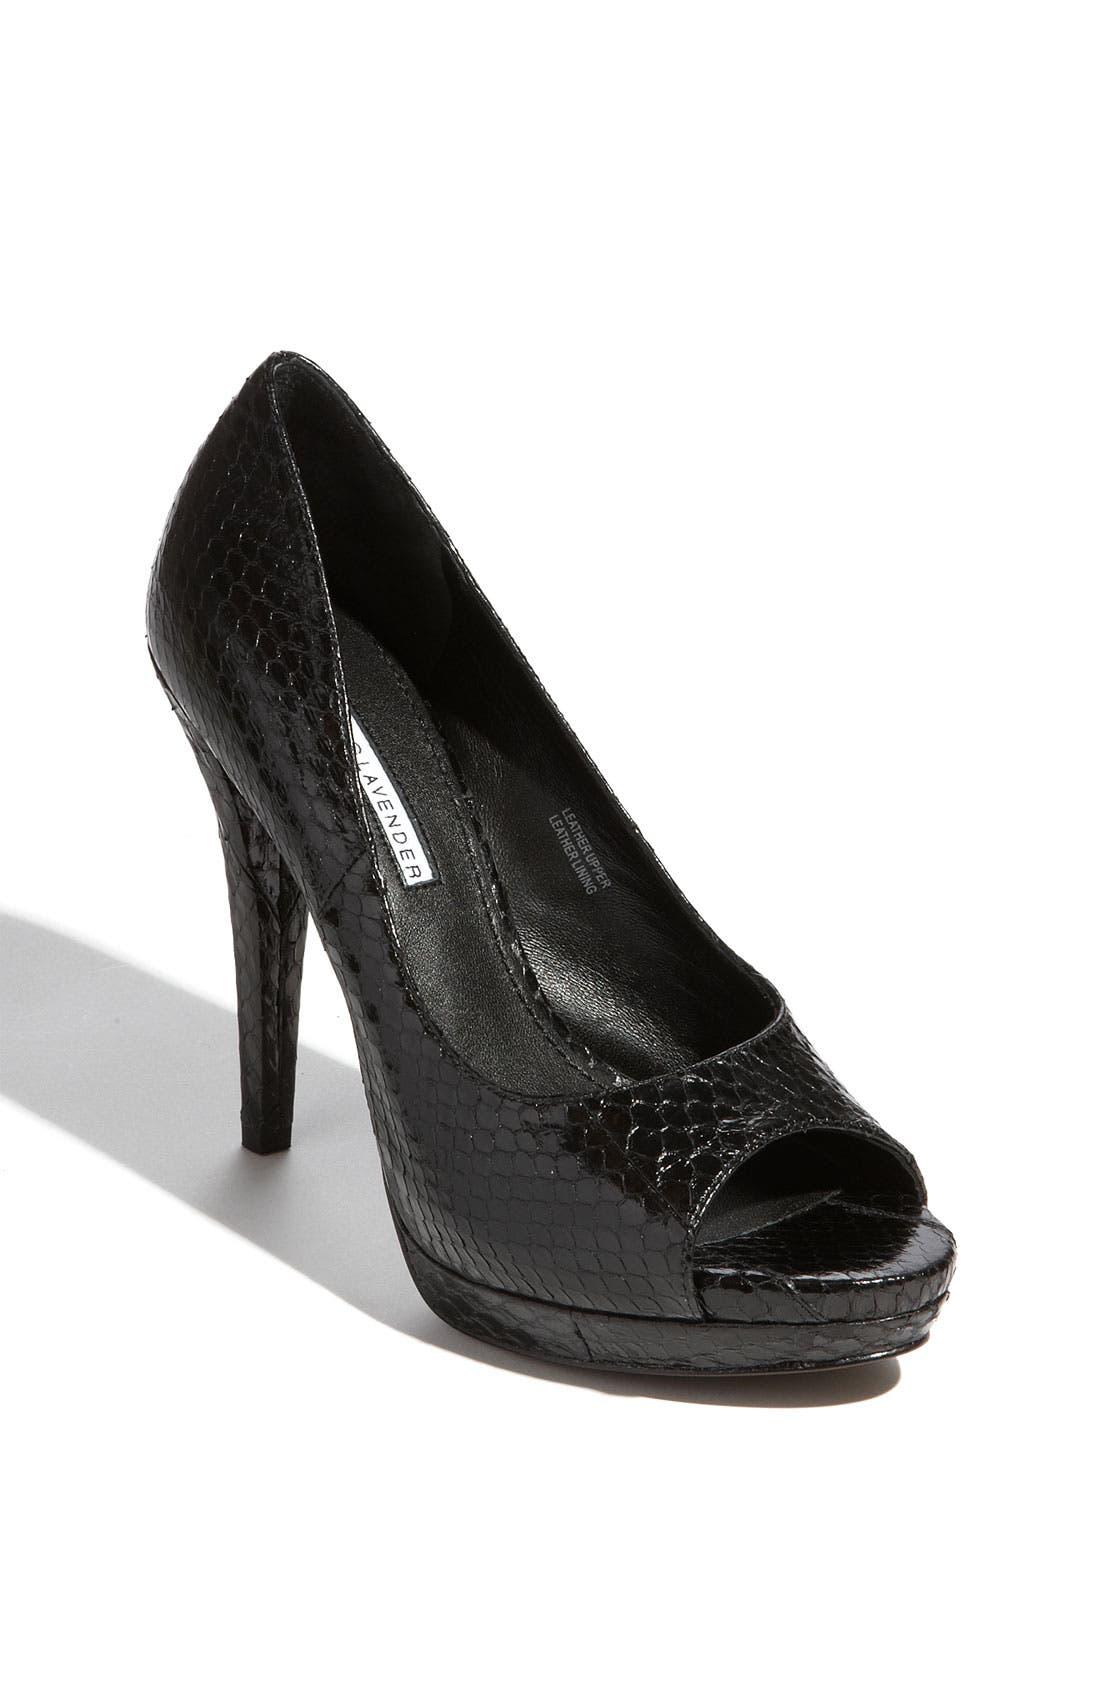 Footwear 'Selima' Peep Toe Pump,                             Main thumbnail 1, color,